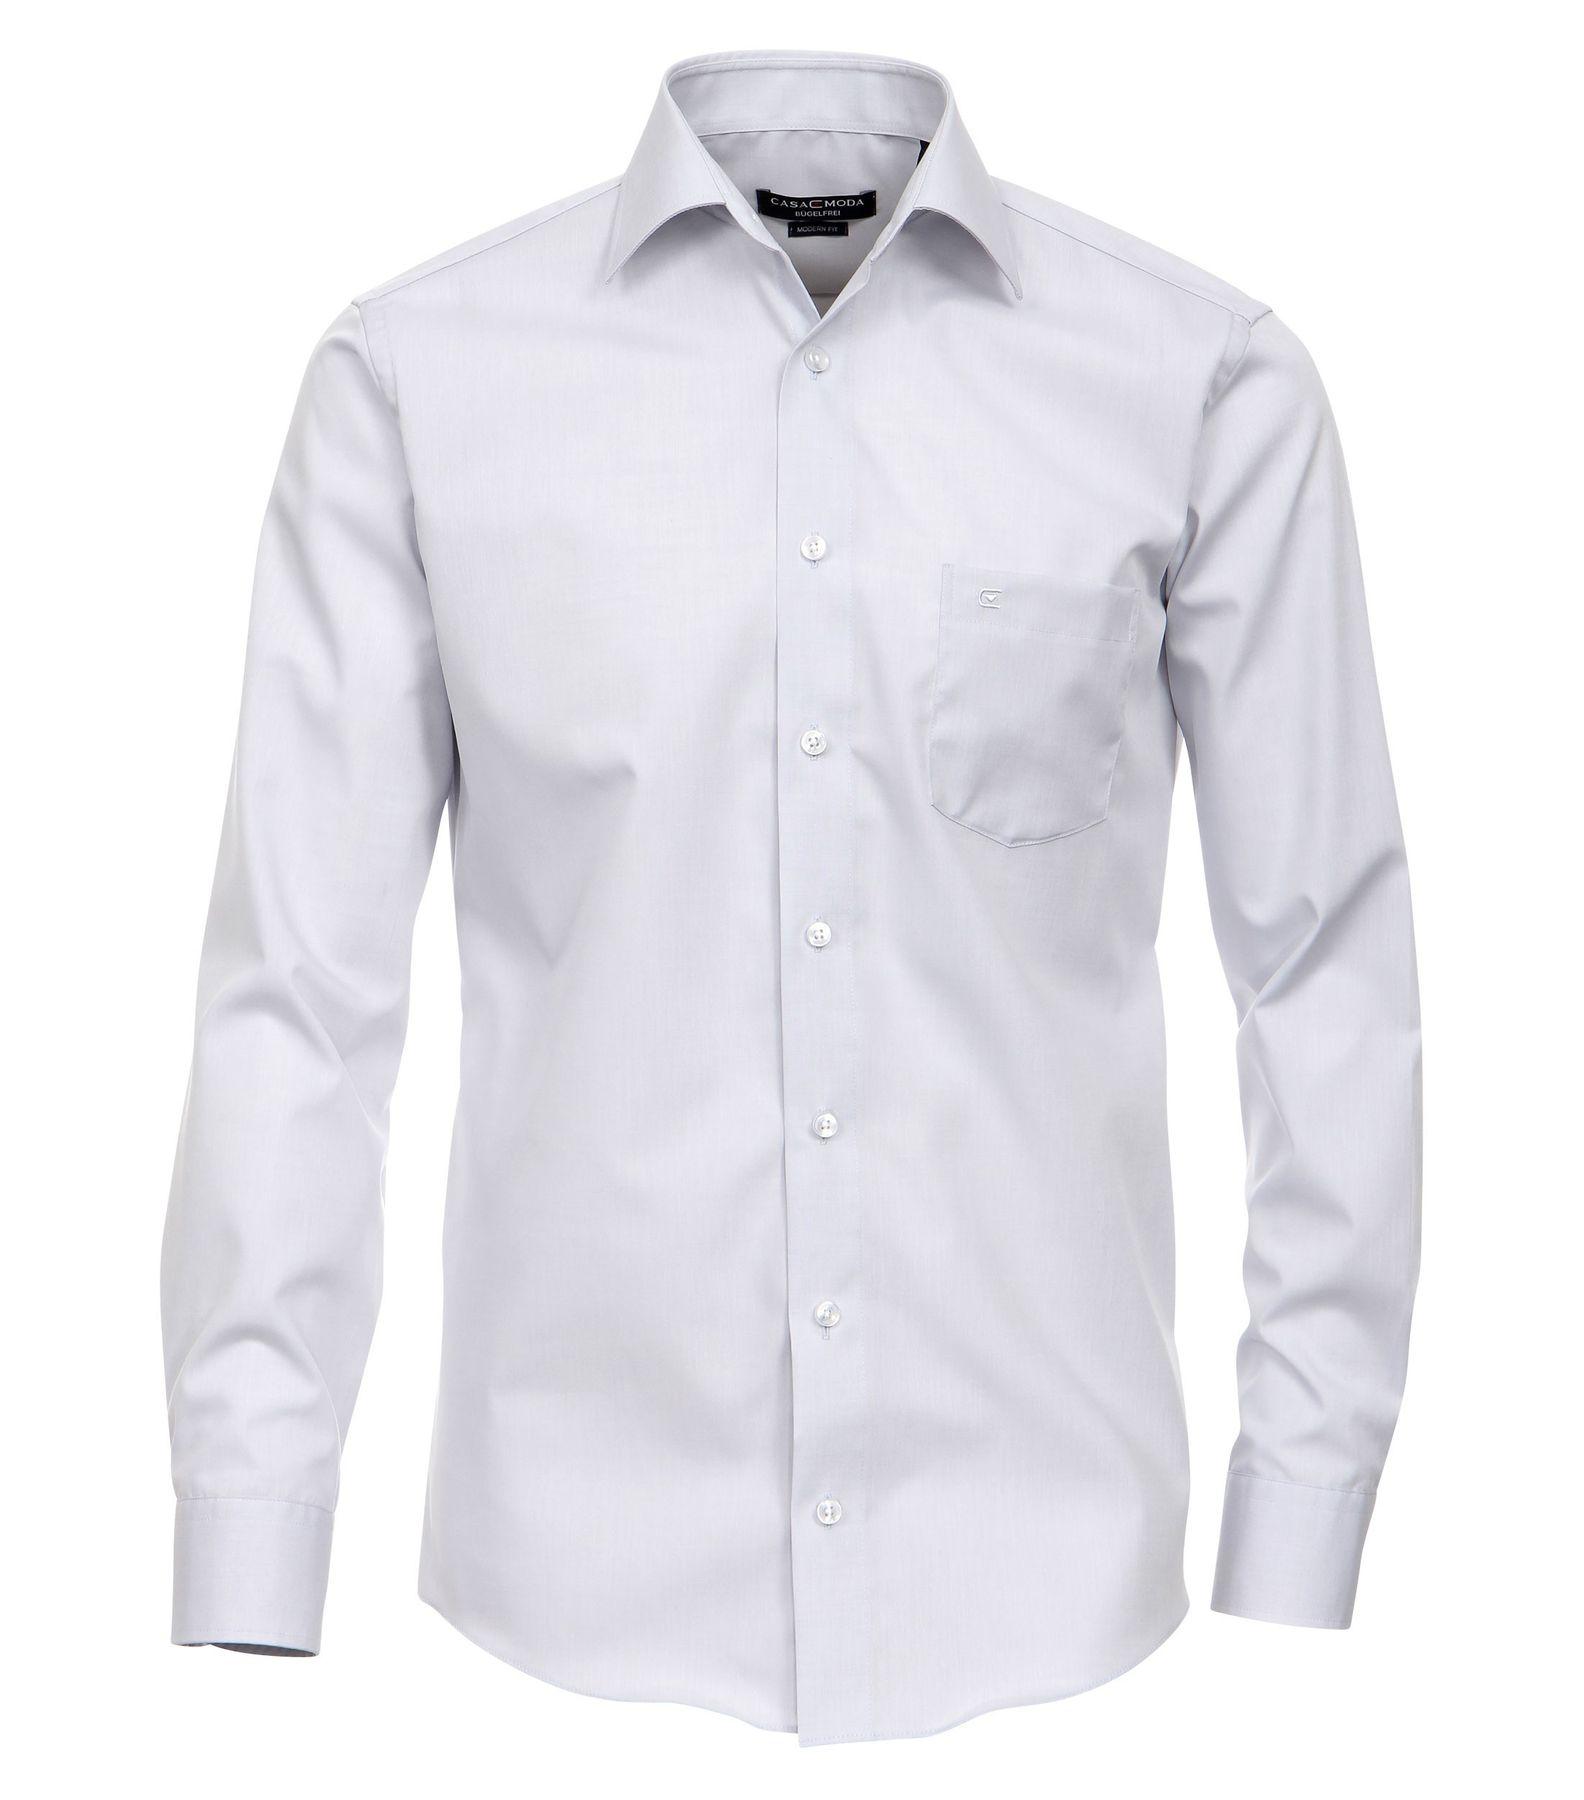 Casamoda - Modern Fit - Bügelfreies Herren Business Langarm Hemd verschiedene Farben (006560A) – Bild 21